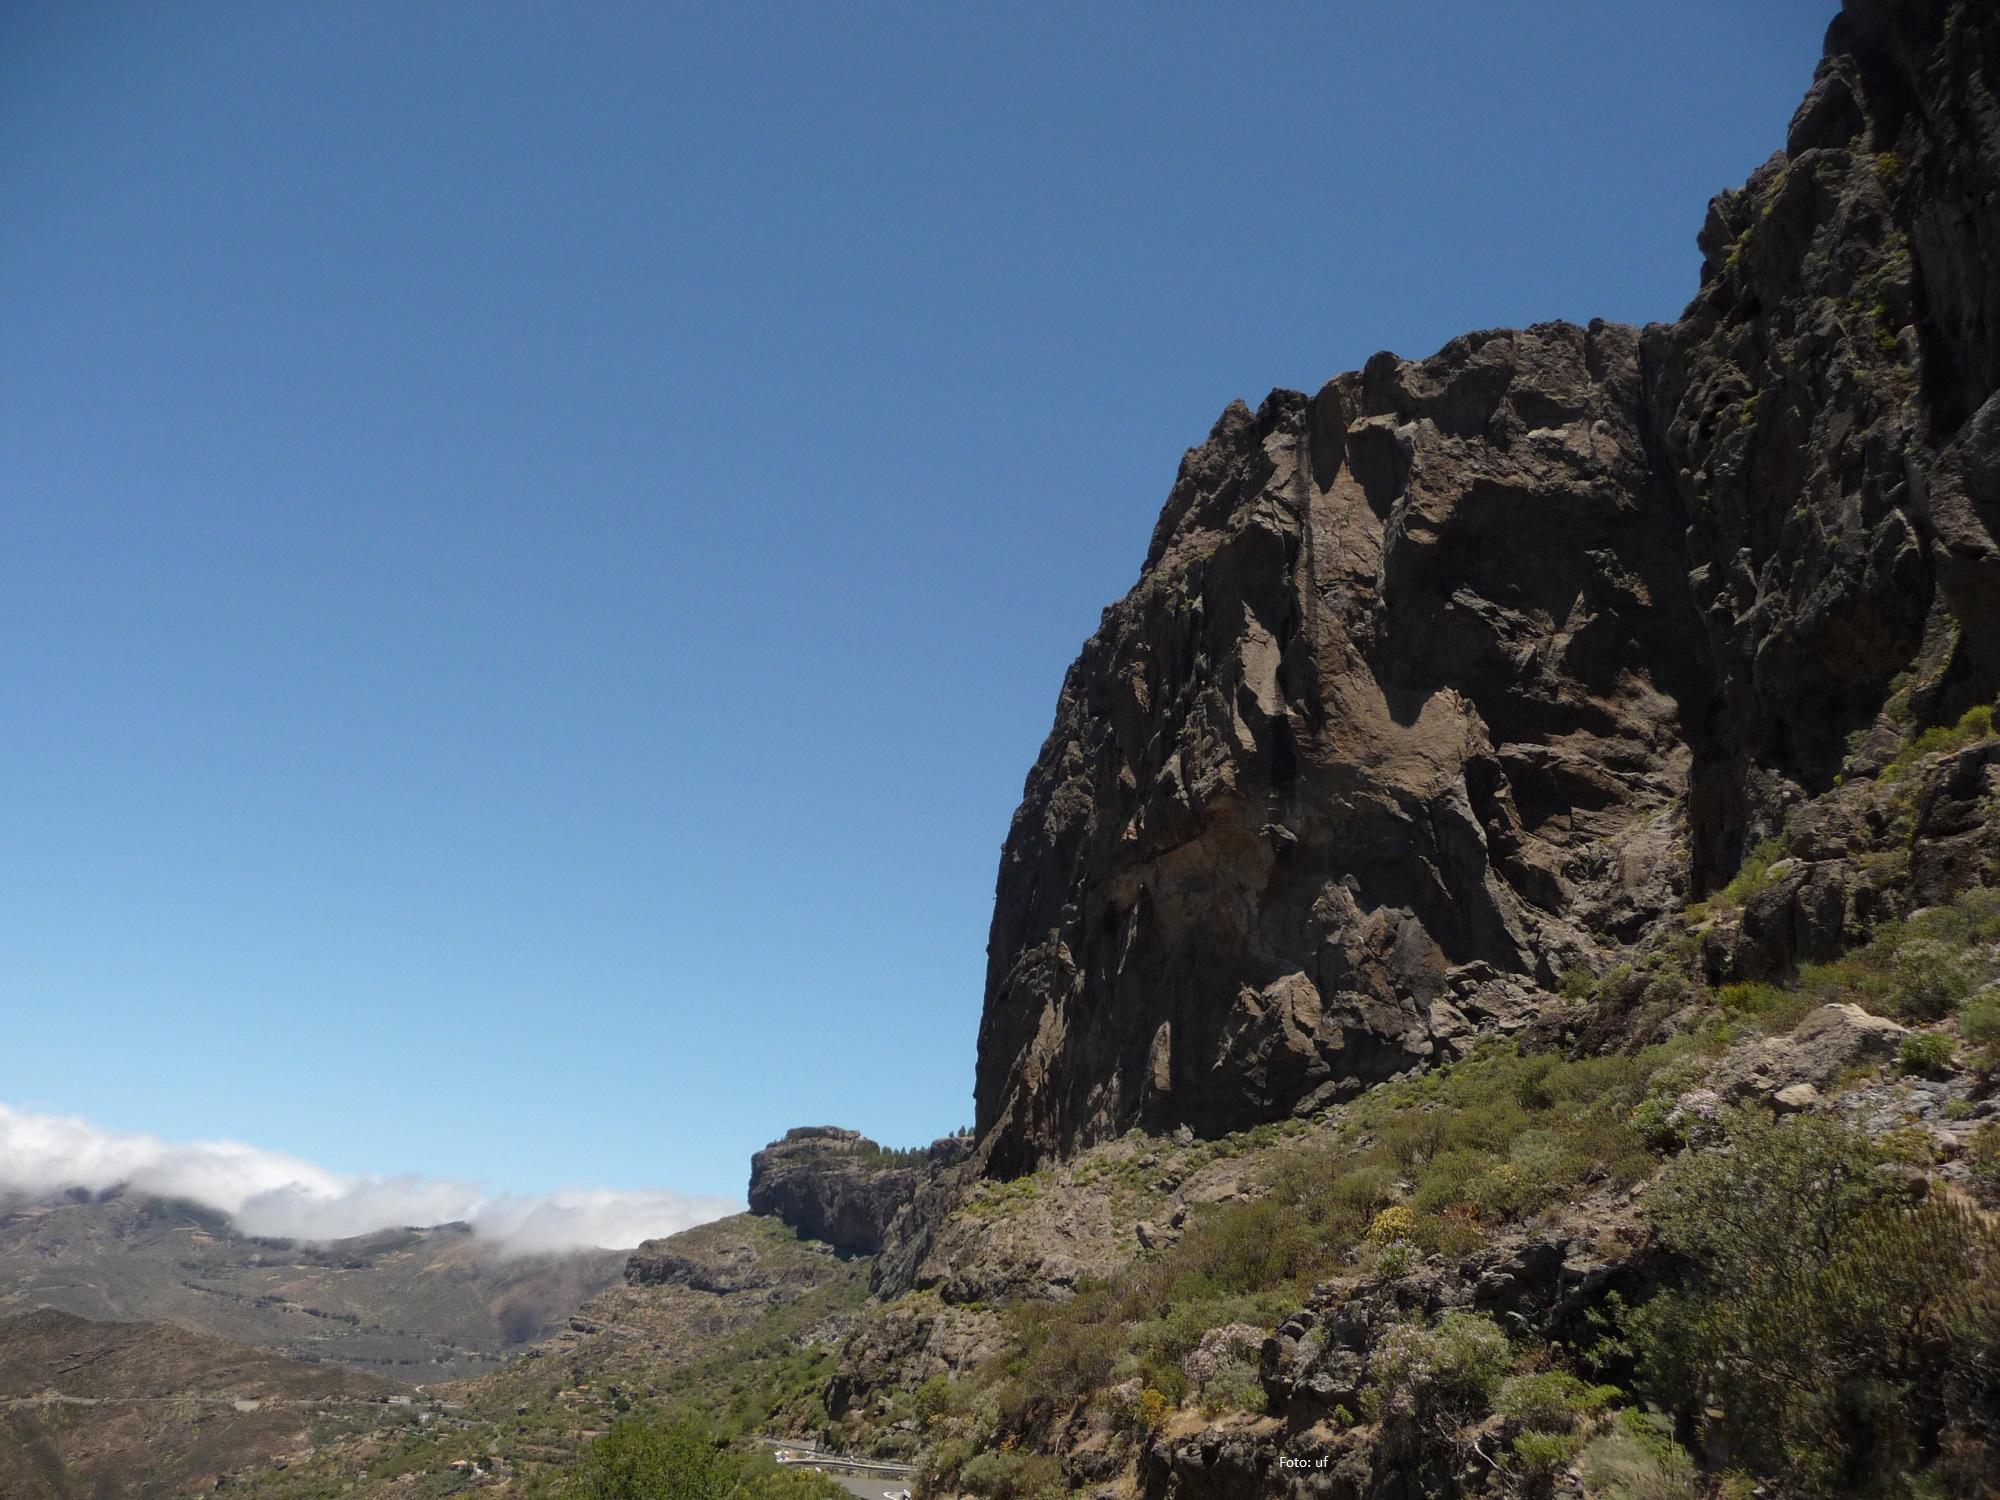 Grandiose, zerklüftete Bergmassive im Inselinneren